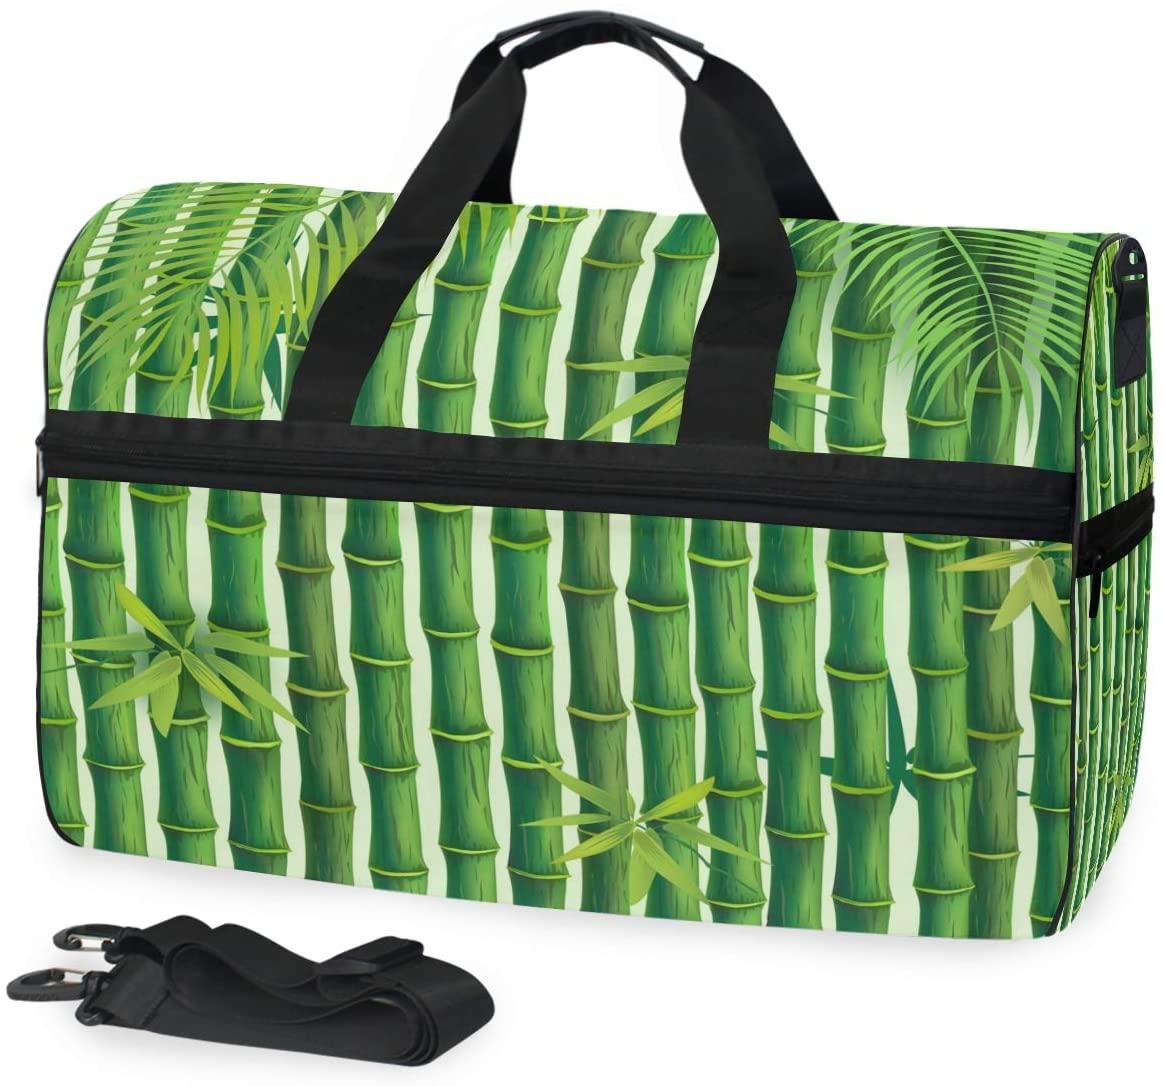 Travel Duffels Bamboo Duffle Bag Luggage Sports Gym for Women & Men